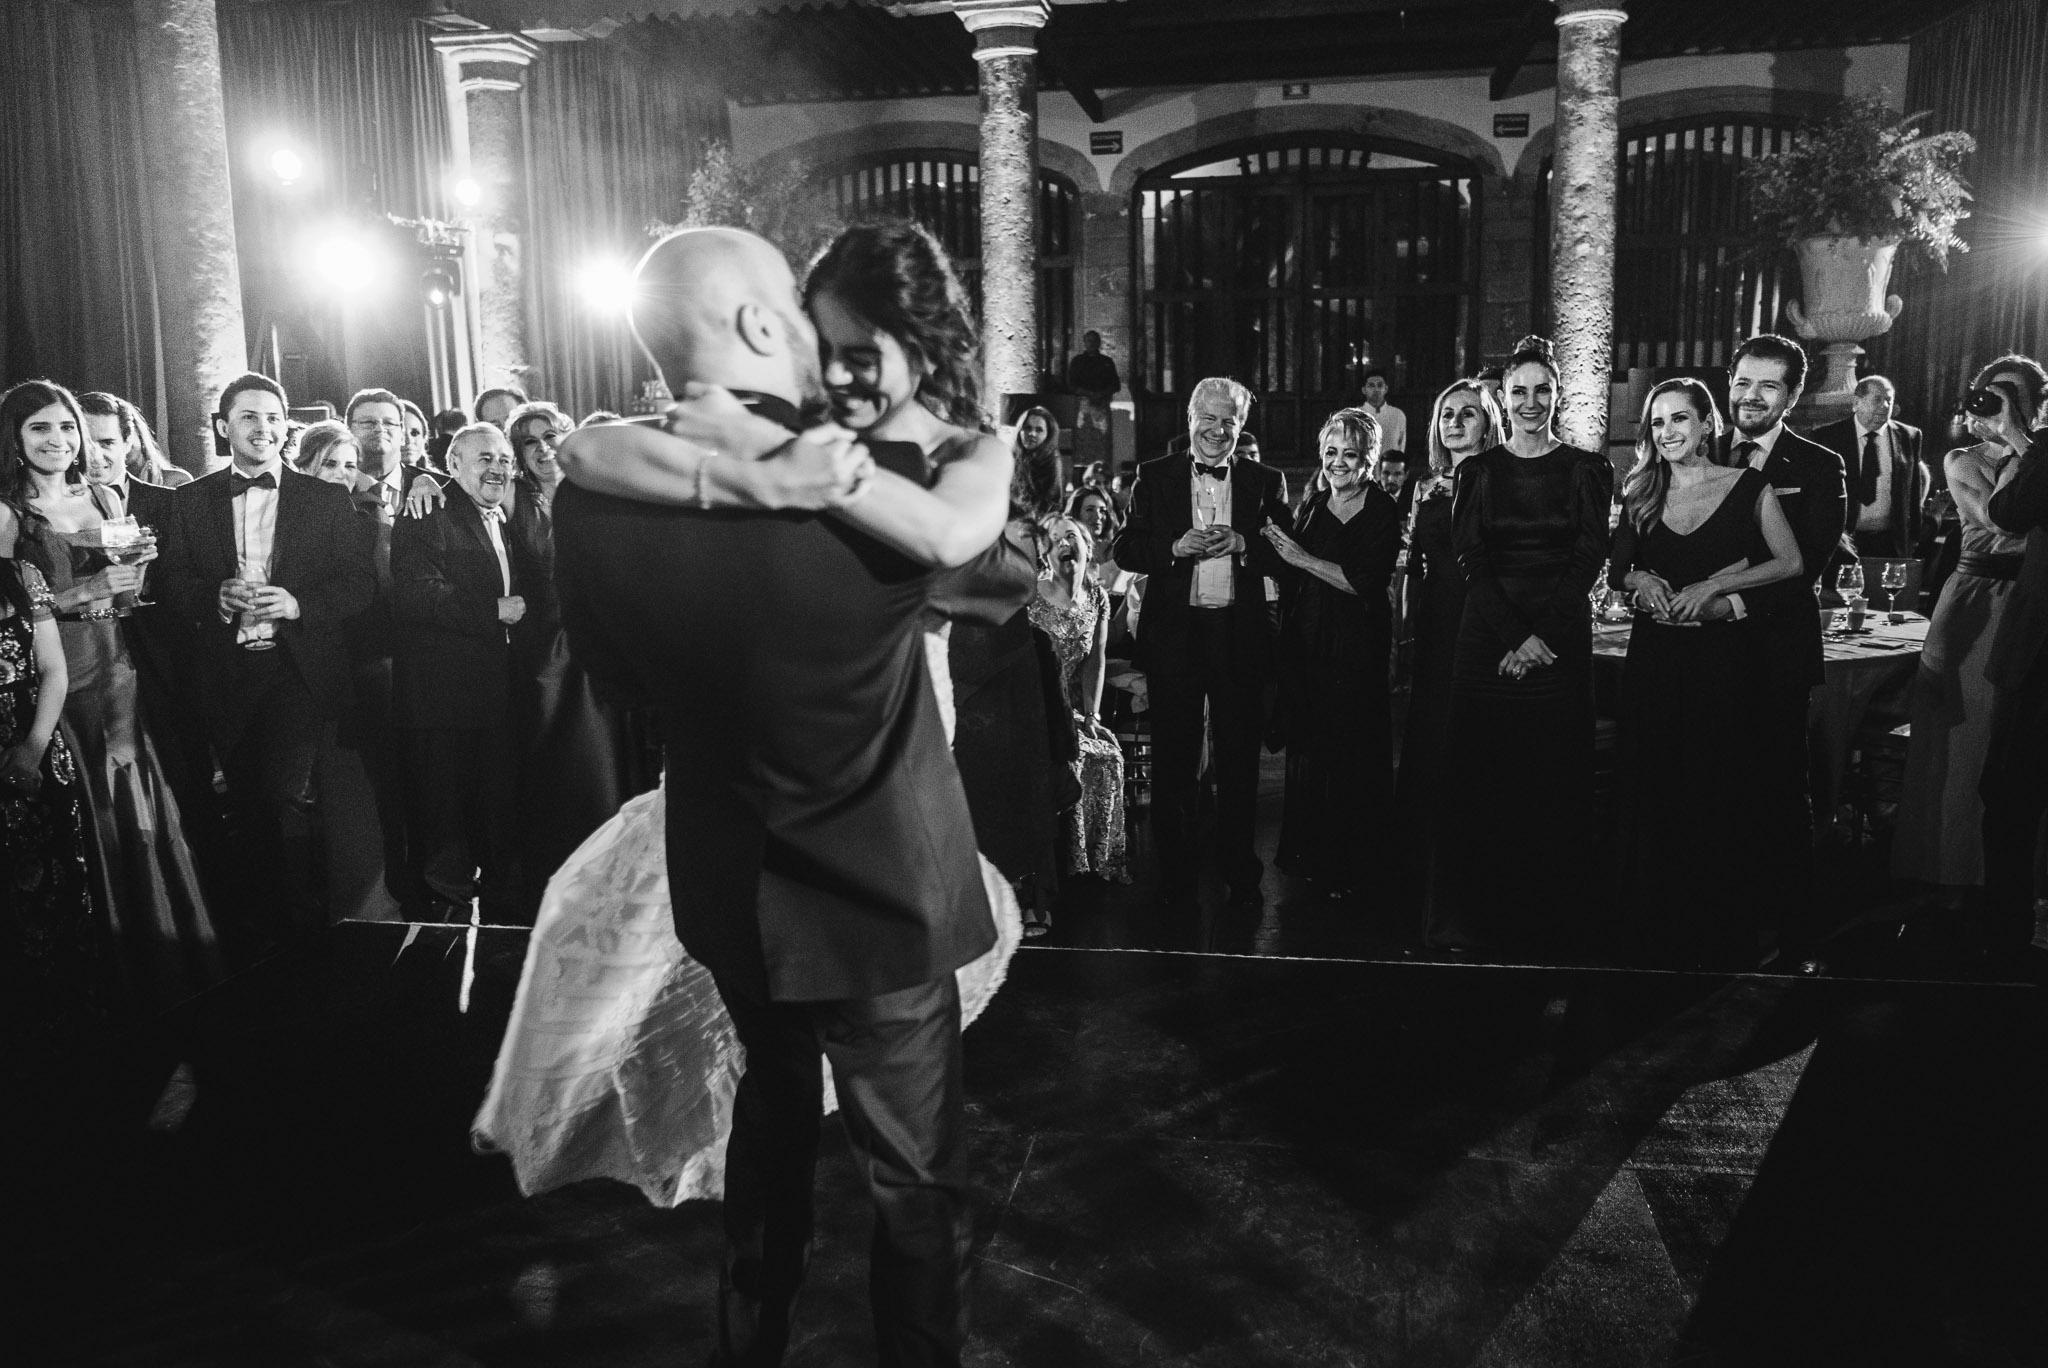 ©www.mauriziosolisbroca.com-20161002maurizio-solis-broca-mexico-canada-wedding-photographer20161002DSC05405-Edit.jpg